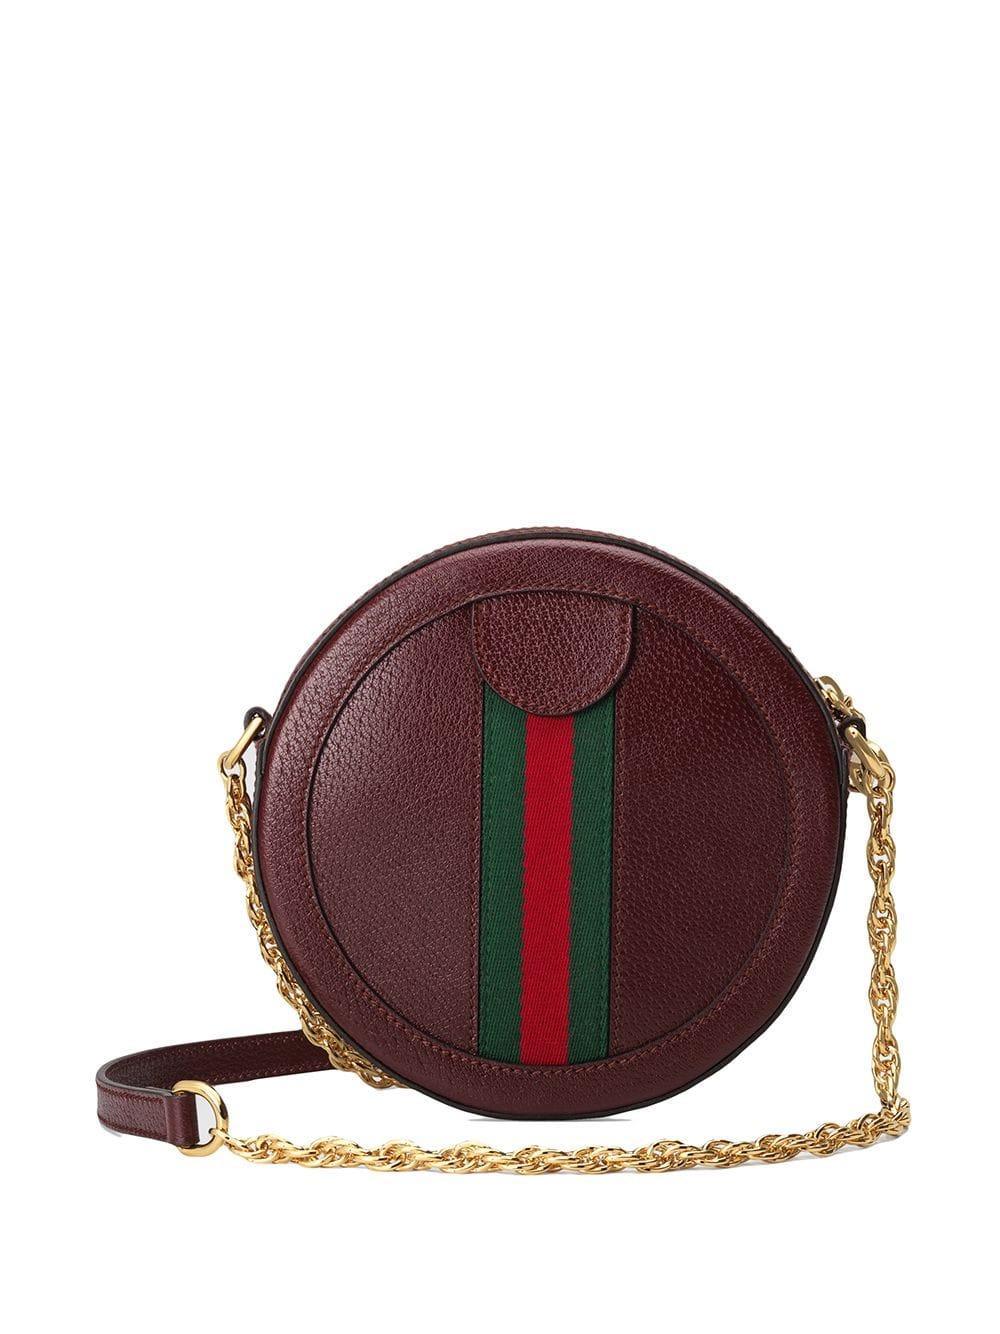 0c394050de1e Lyst - Gucci Ophidia Mini Round Shoulder Bag in Red